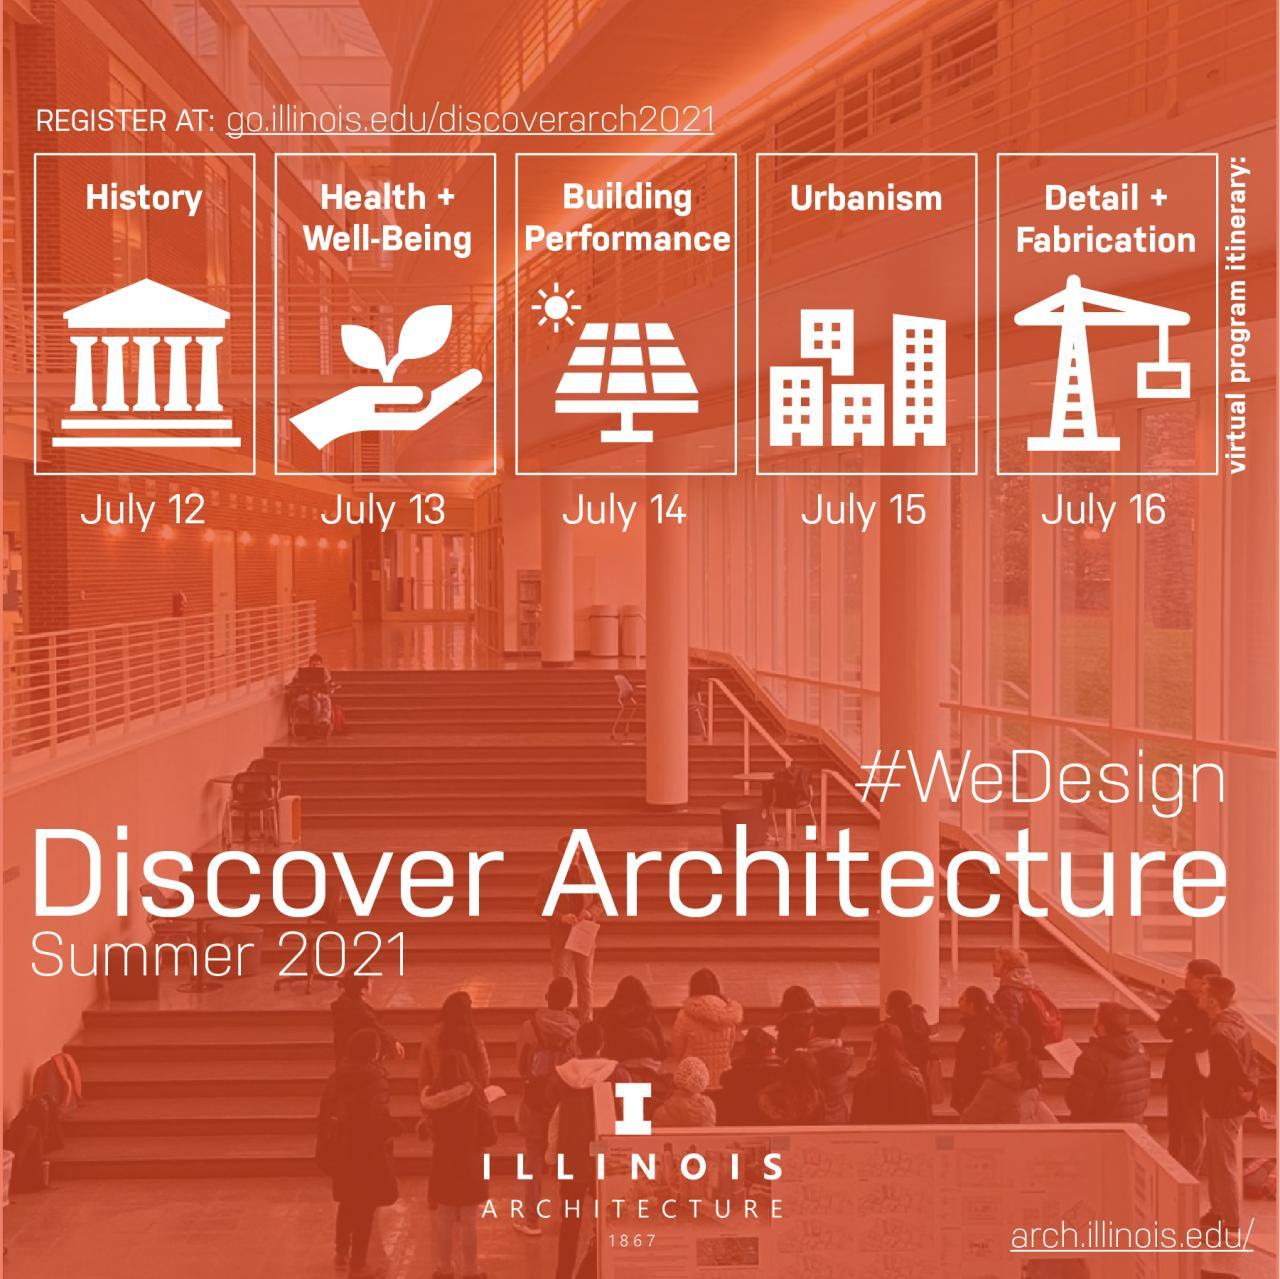 Discover Architecture orange graphic with program schedule